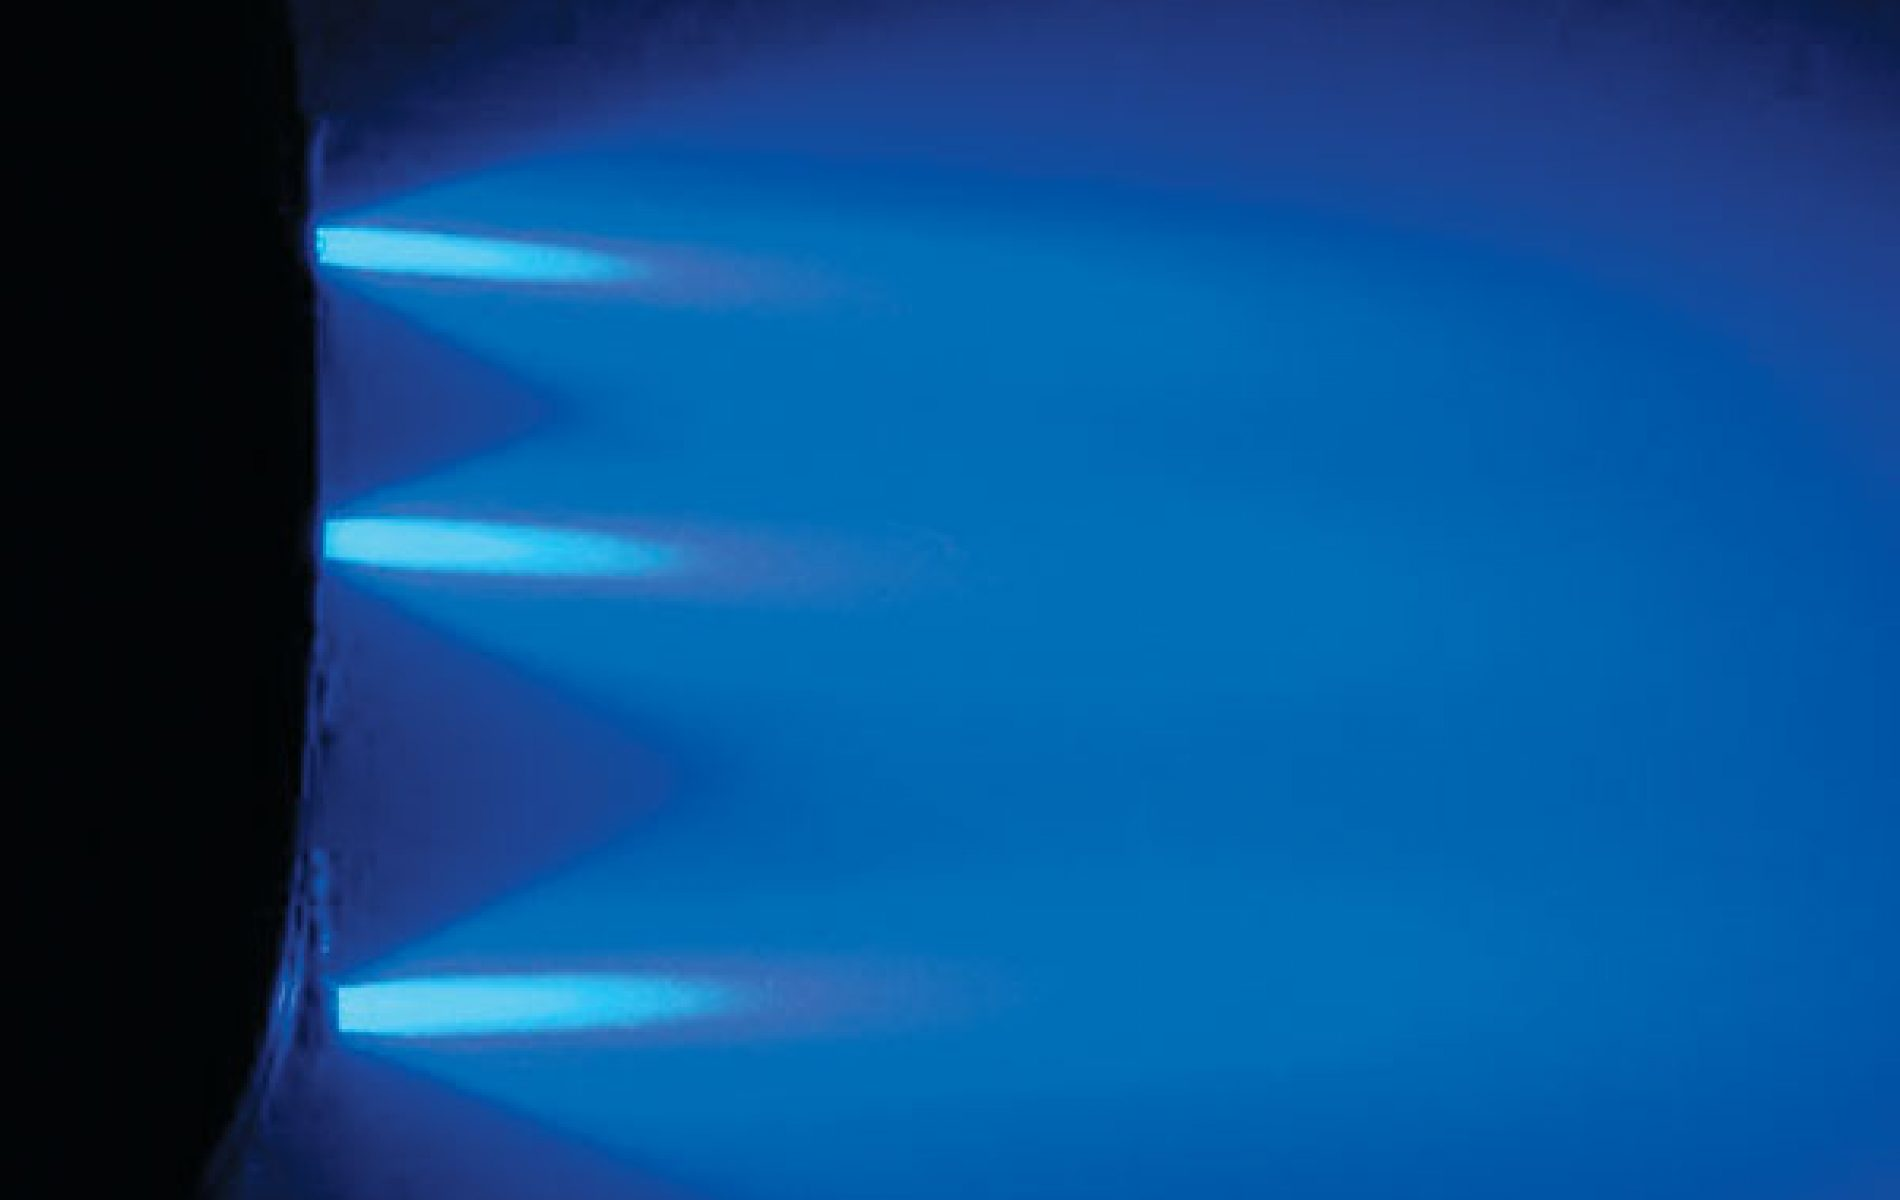 Underwater-lights-available-for-alll-models-1900x1200.jpg